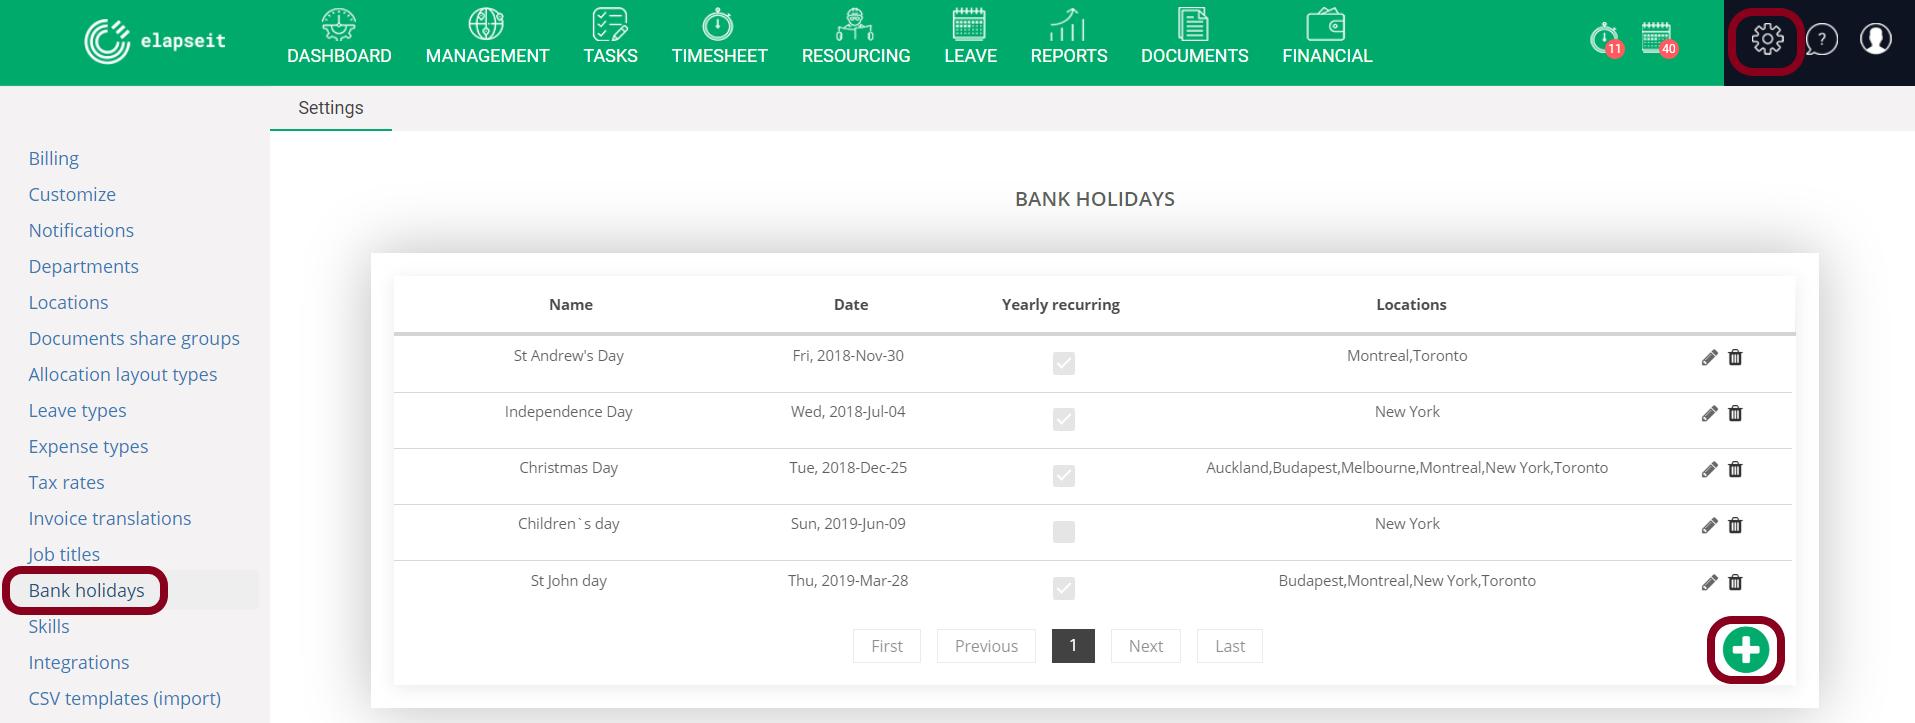 Bank holidays set per location